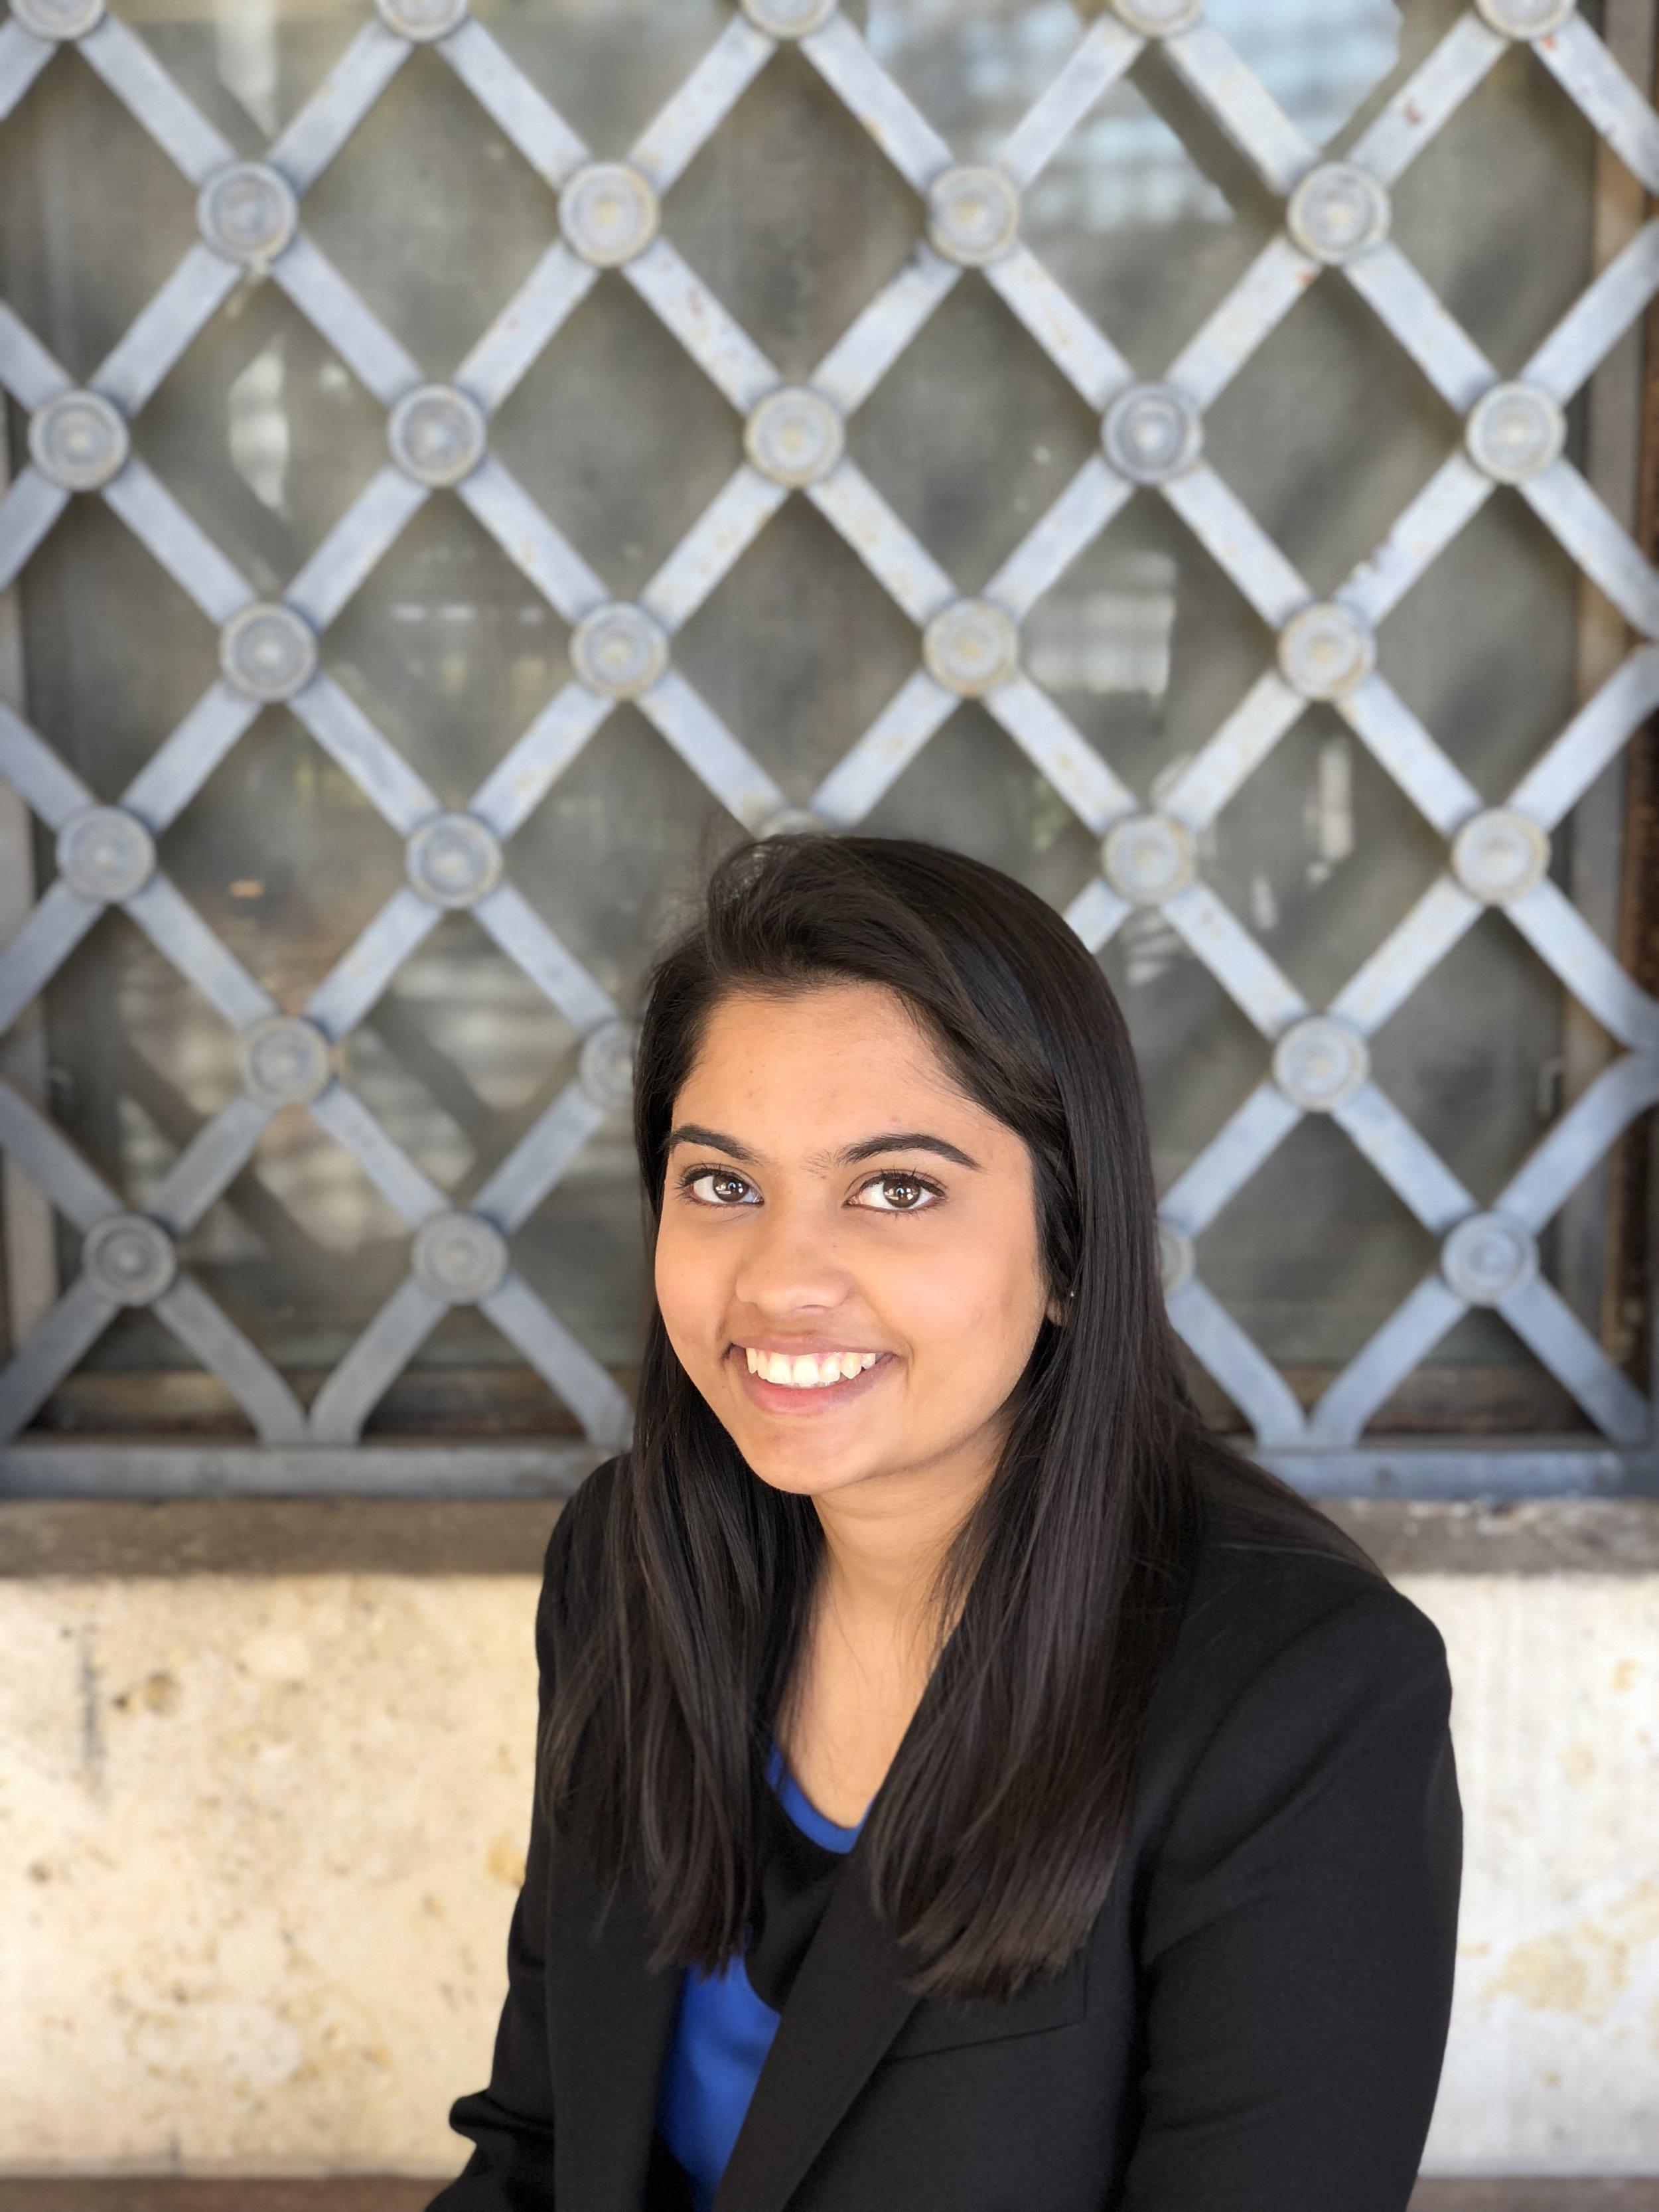 Dhwani Dawar, Research Intern